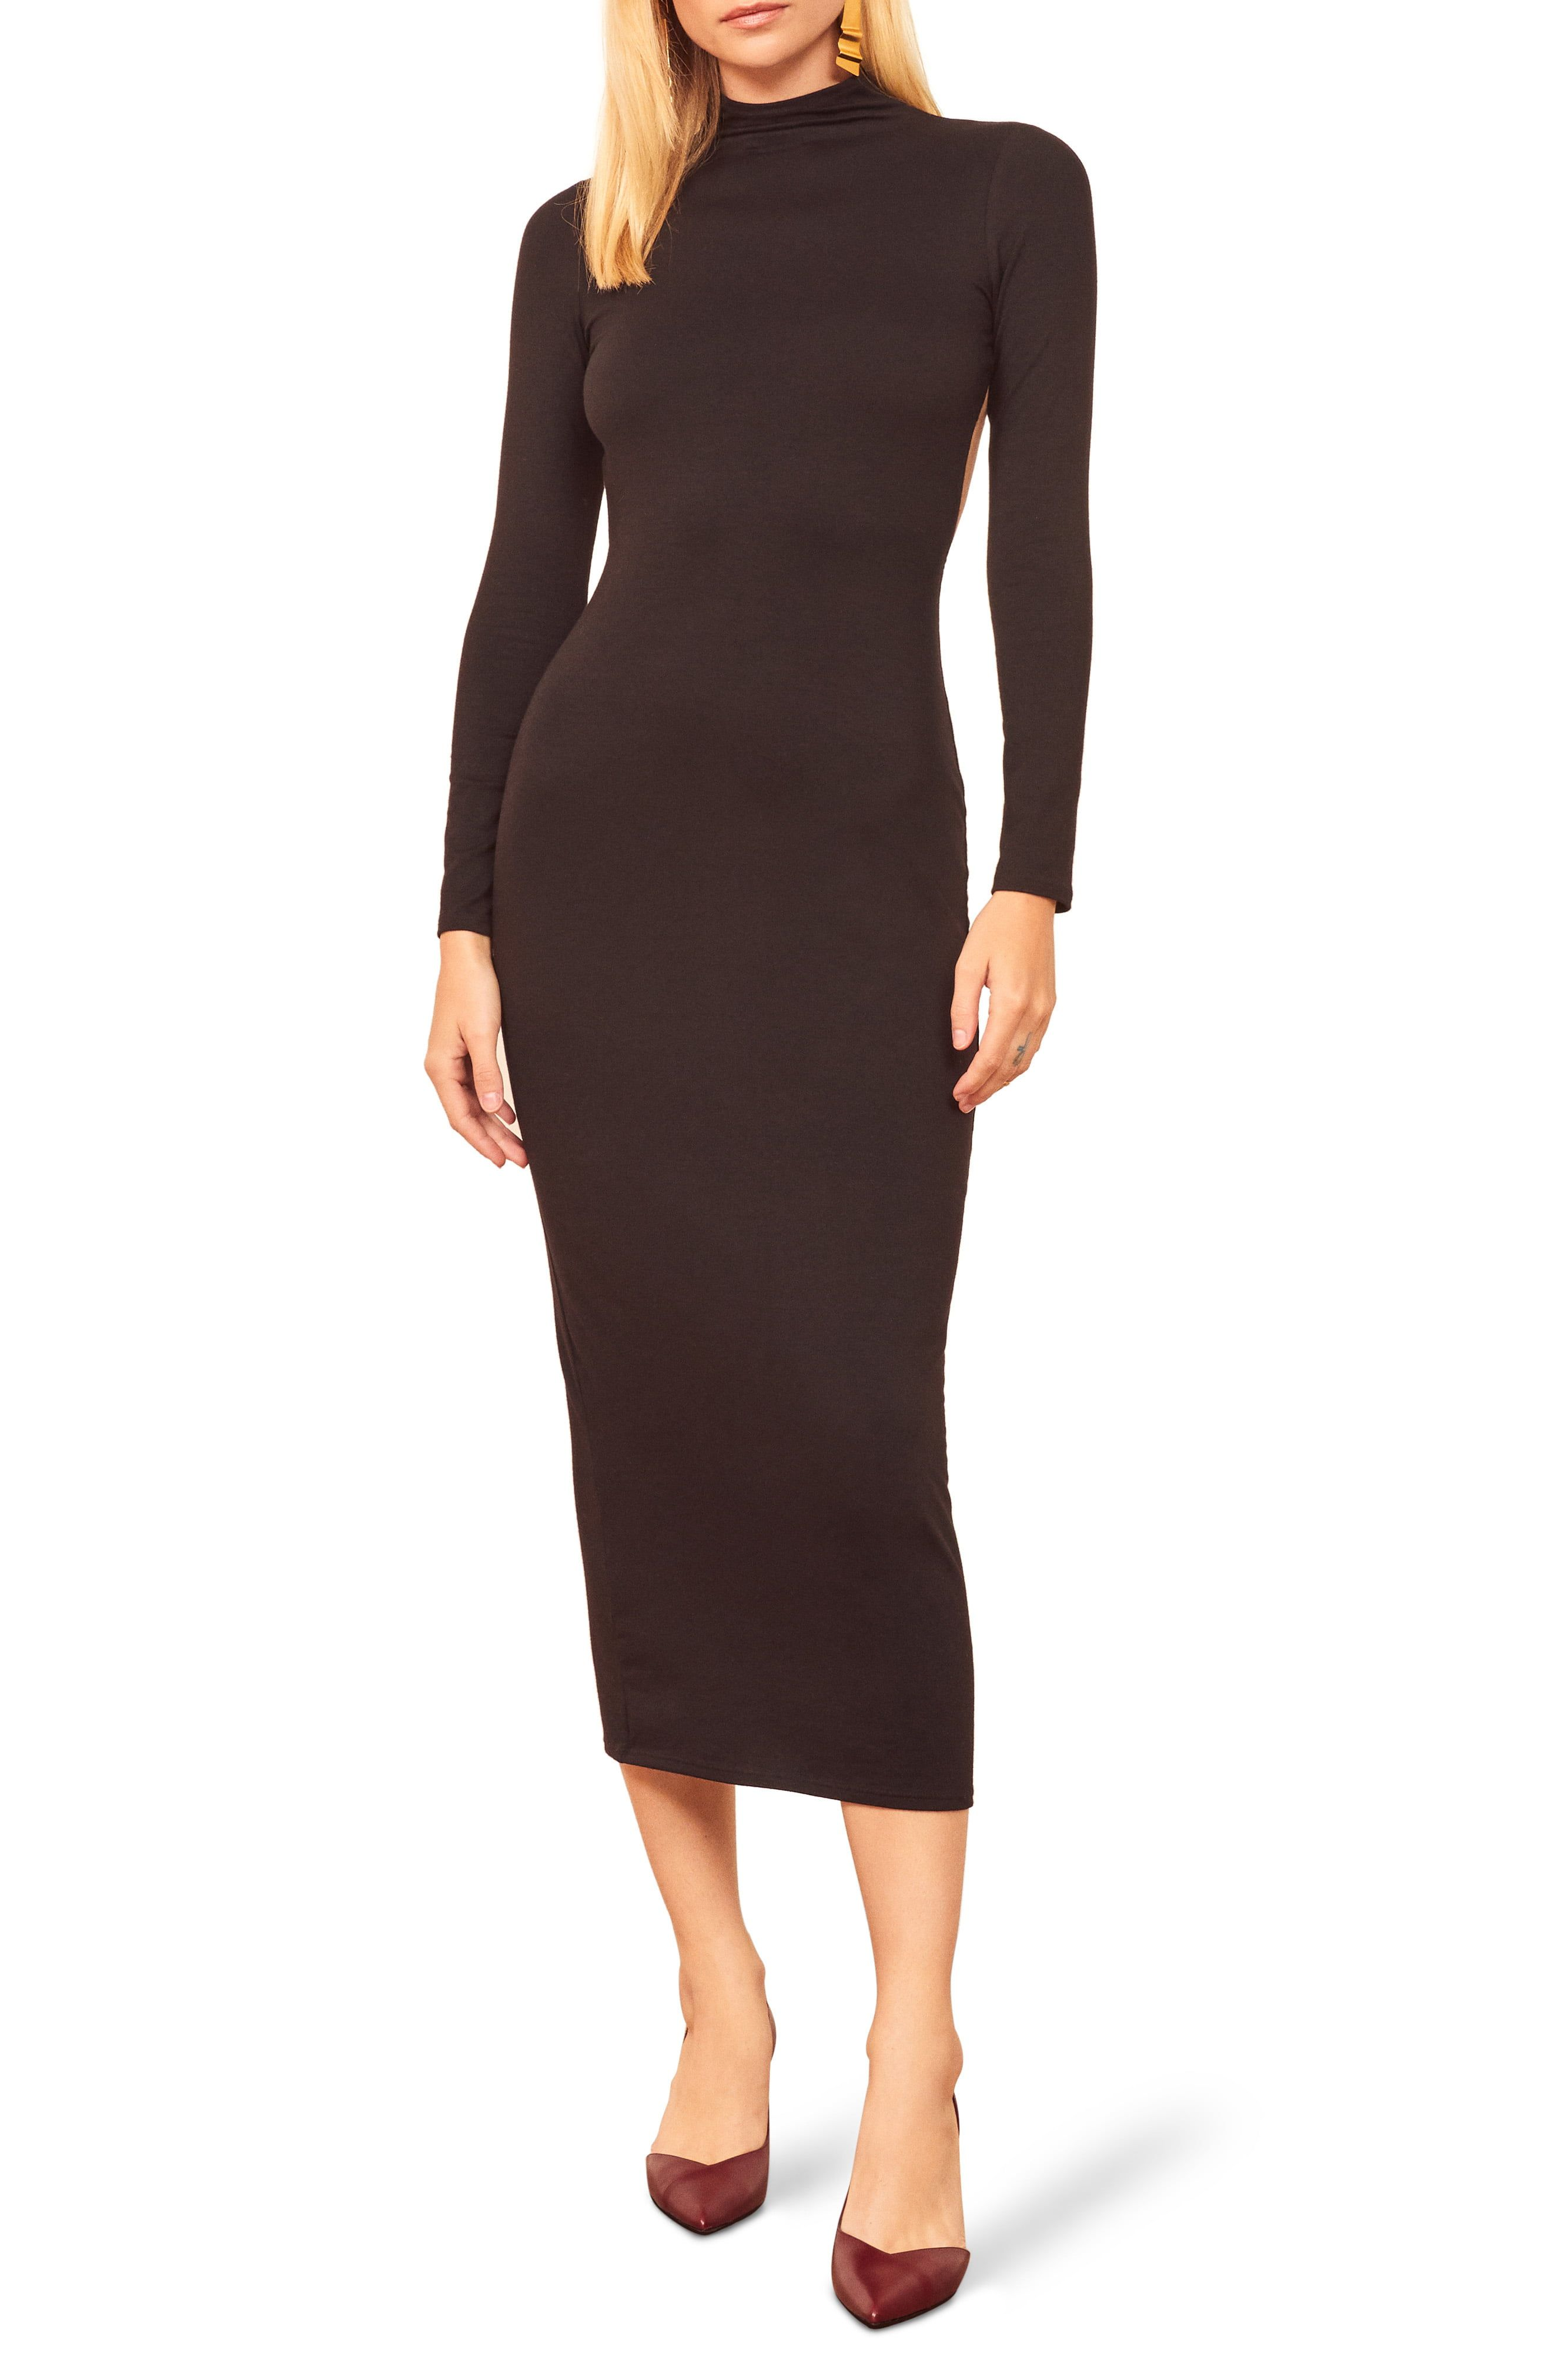 30+ Long sleeve sheath dress ideas